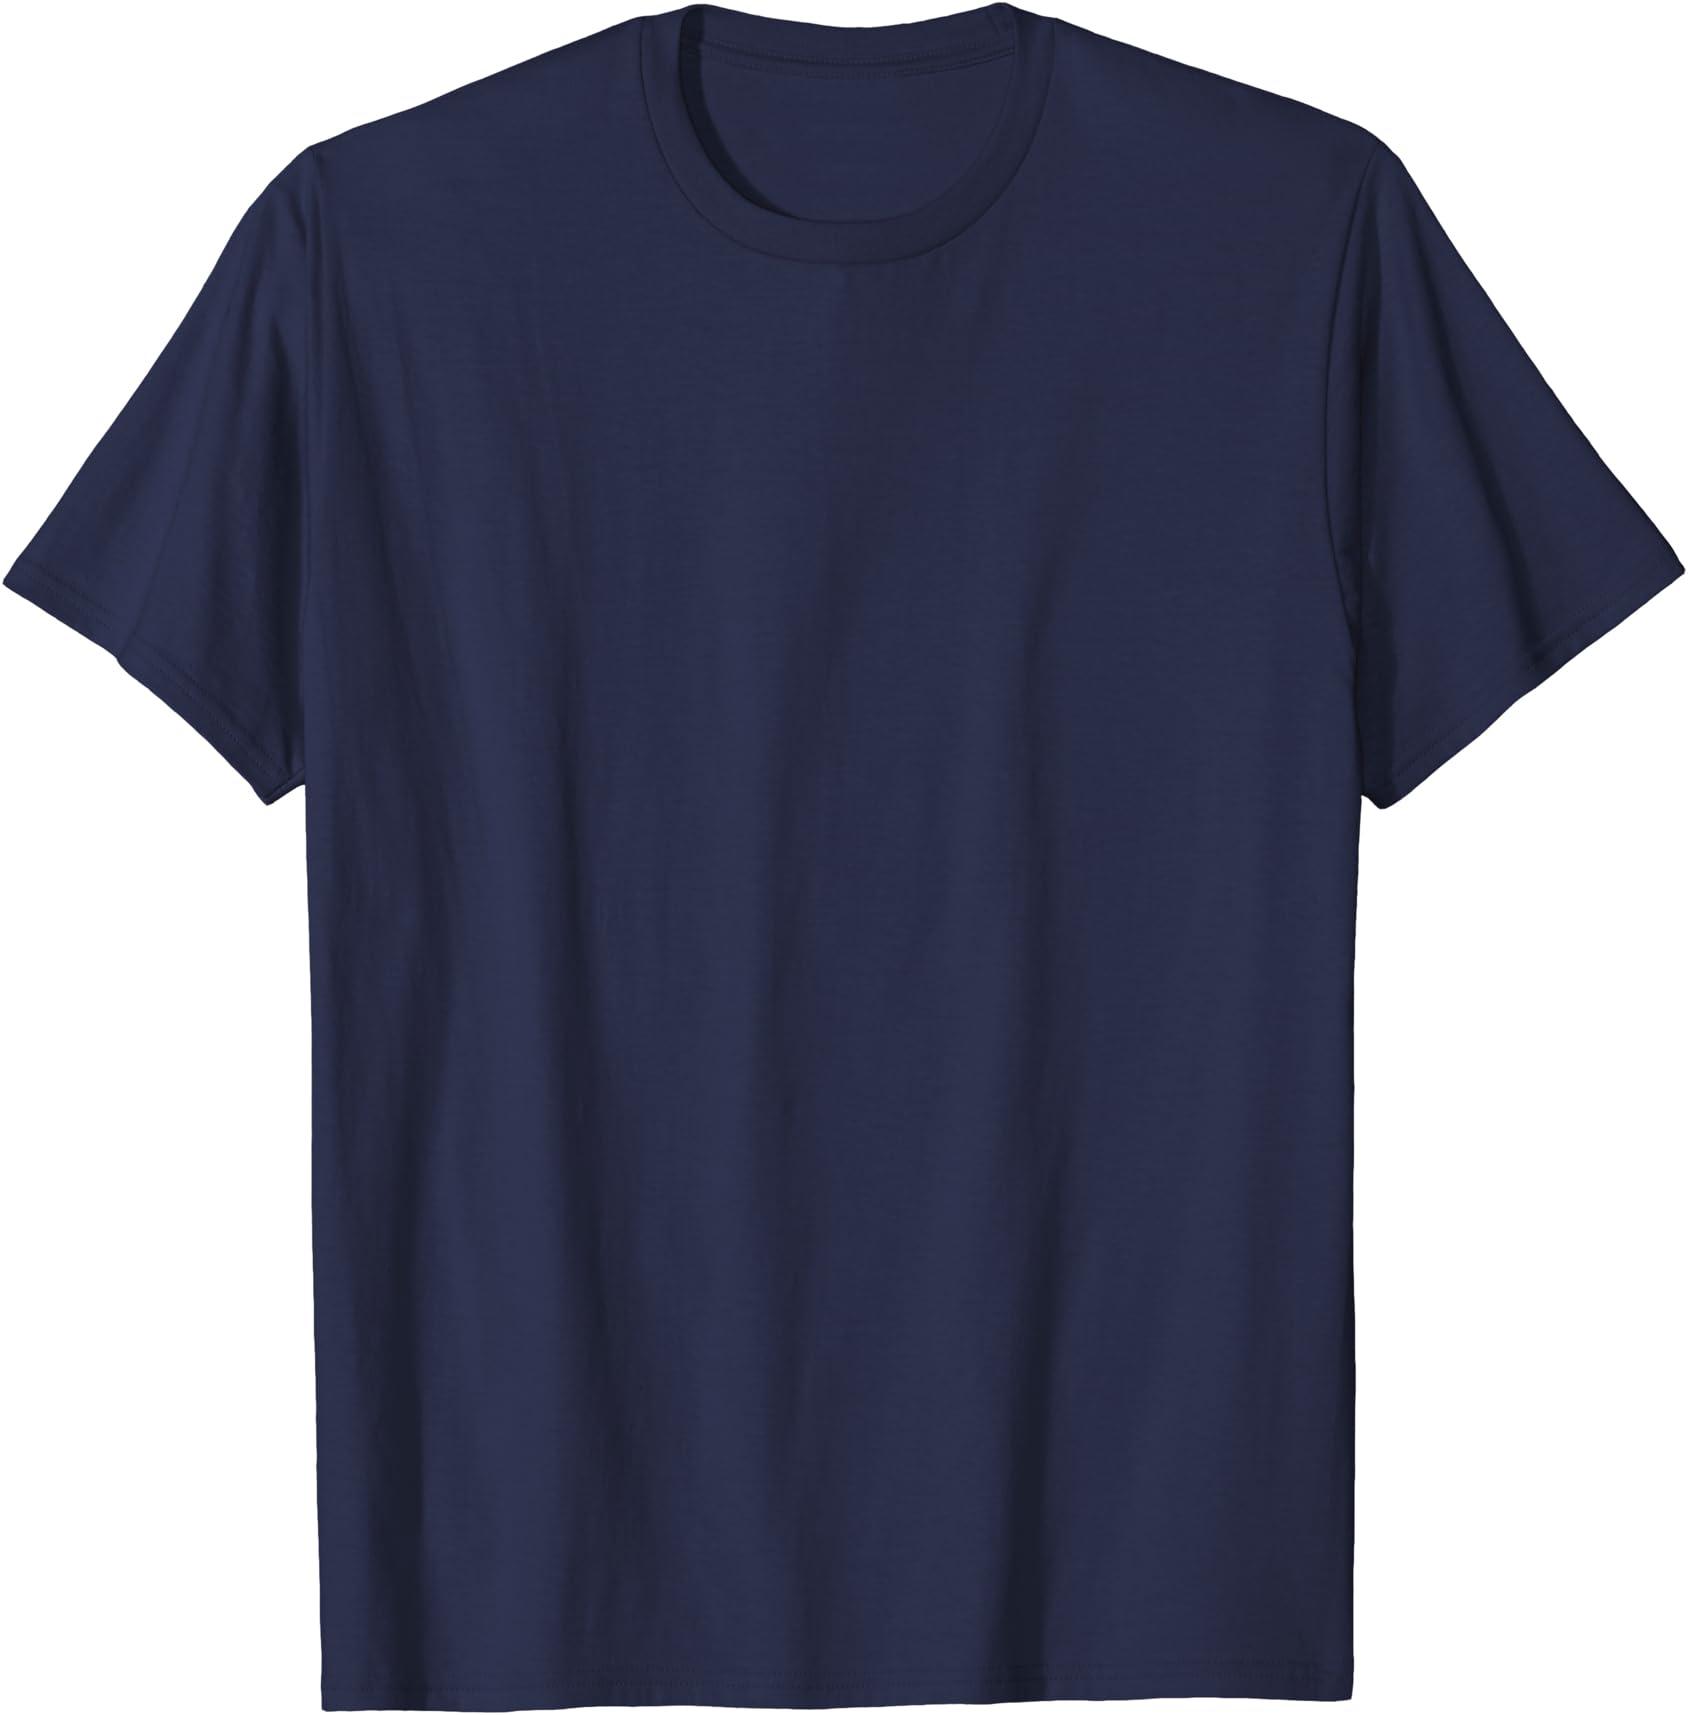 Crash Test Dummies T Shirt